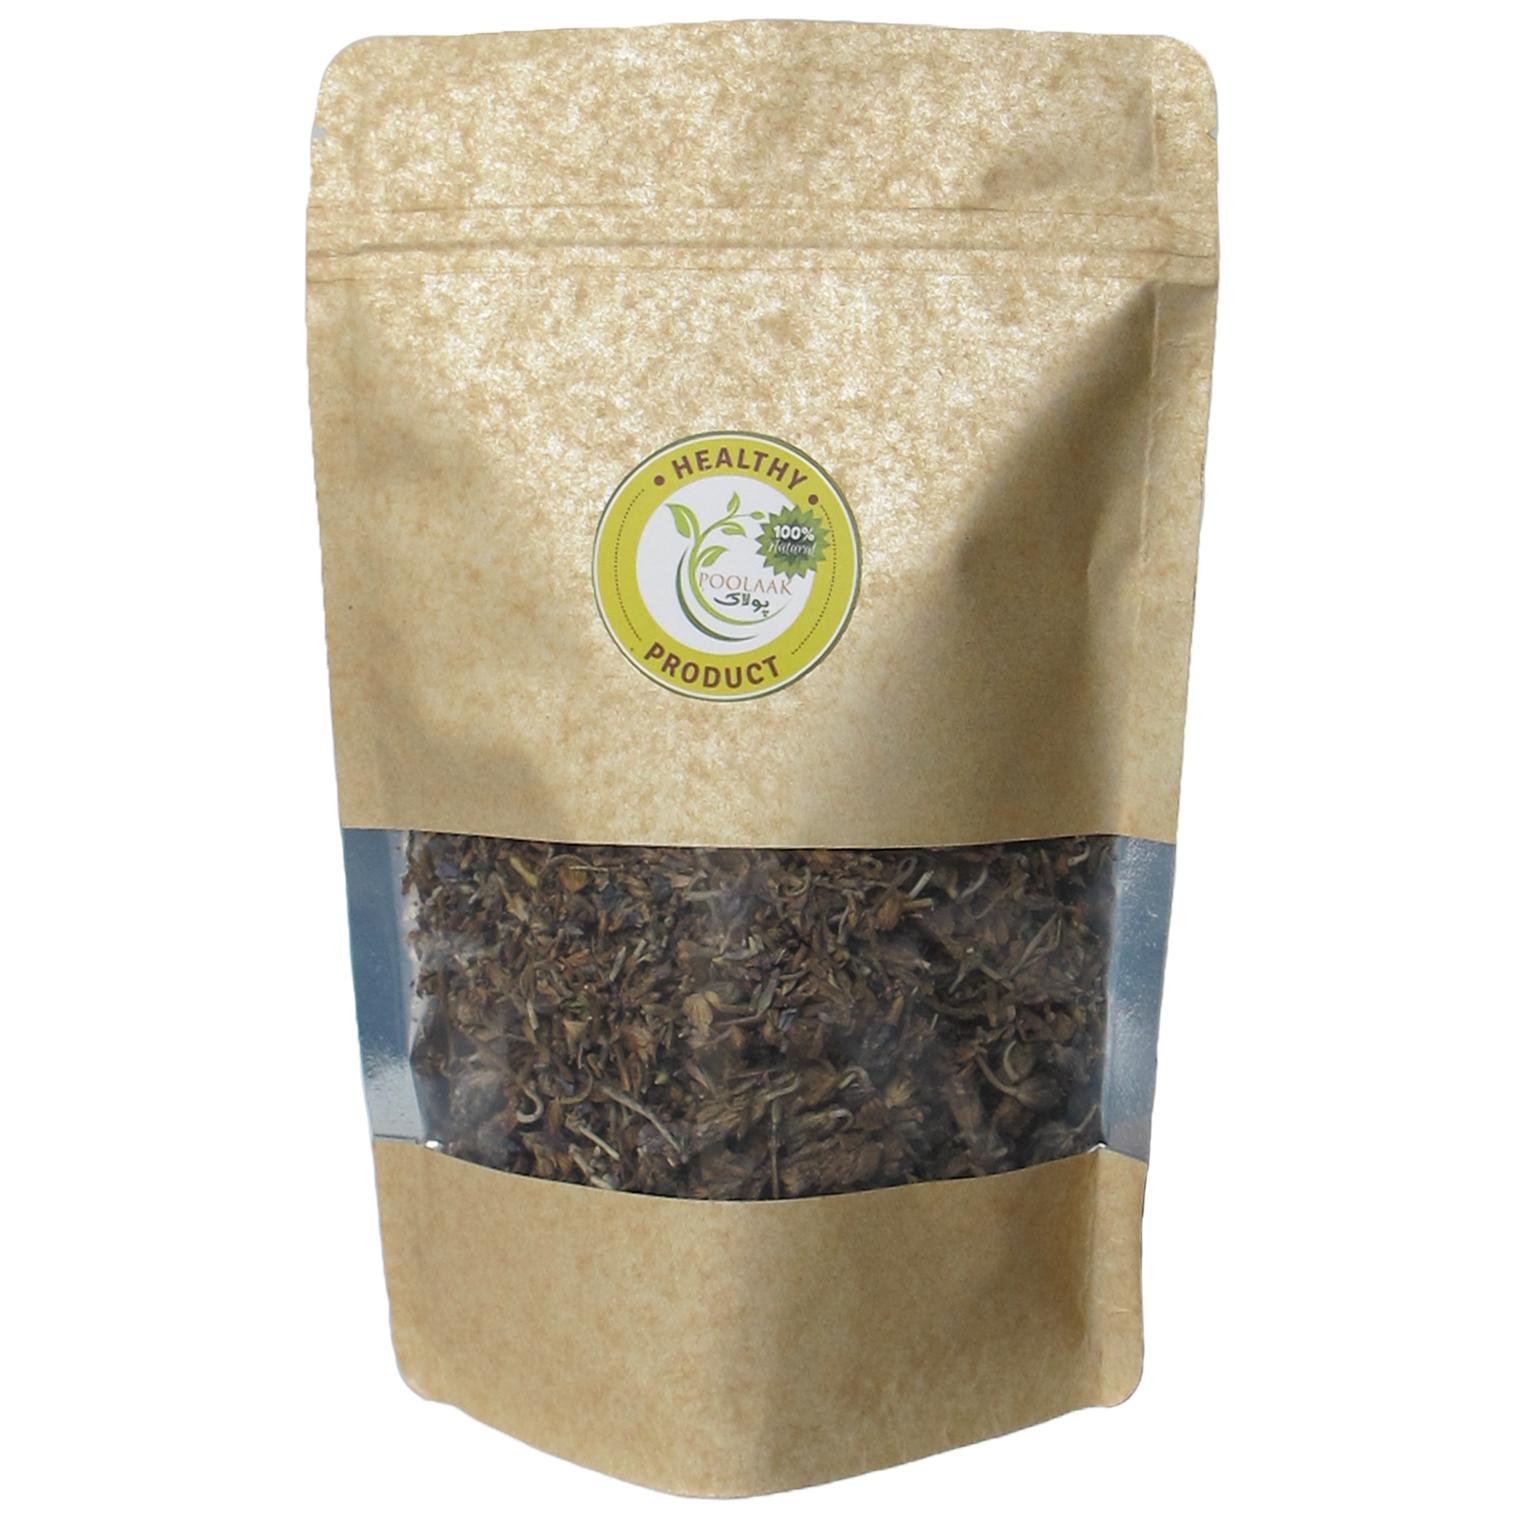 دمنوش گیاهی اسطوخودوس پولاک - 15 گرم